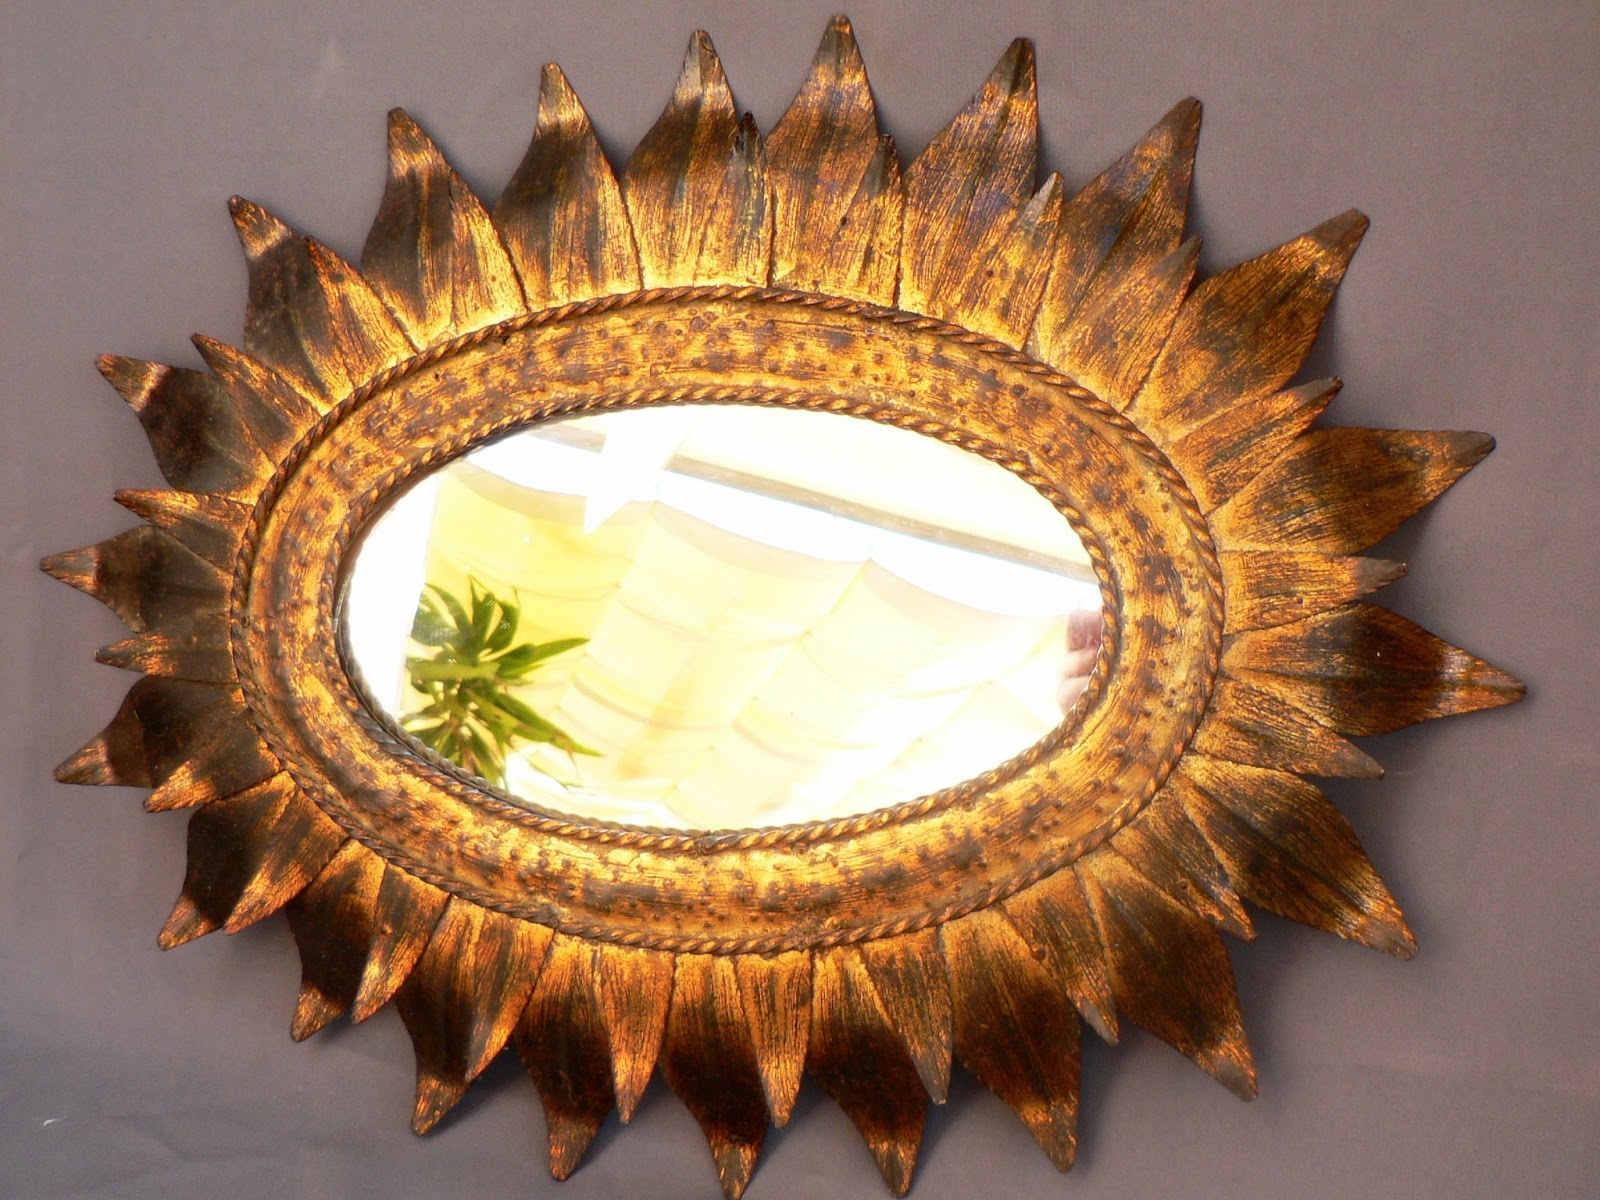 Vintage kitsch siglo xx espejo metalico dorado patinado for Espejo ovalado dorado